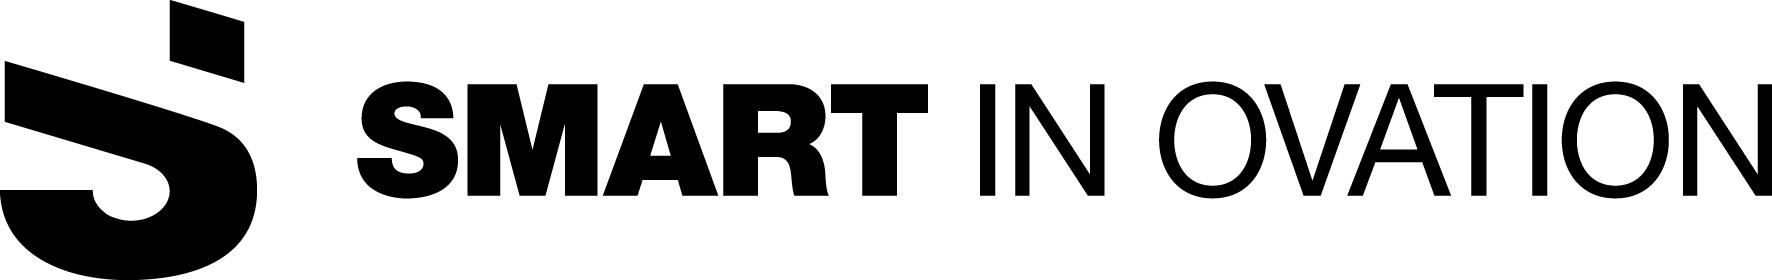 SMART IN OVATION GmbH - Logo